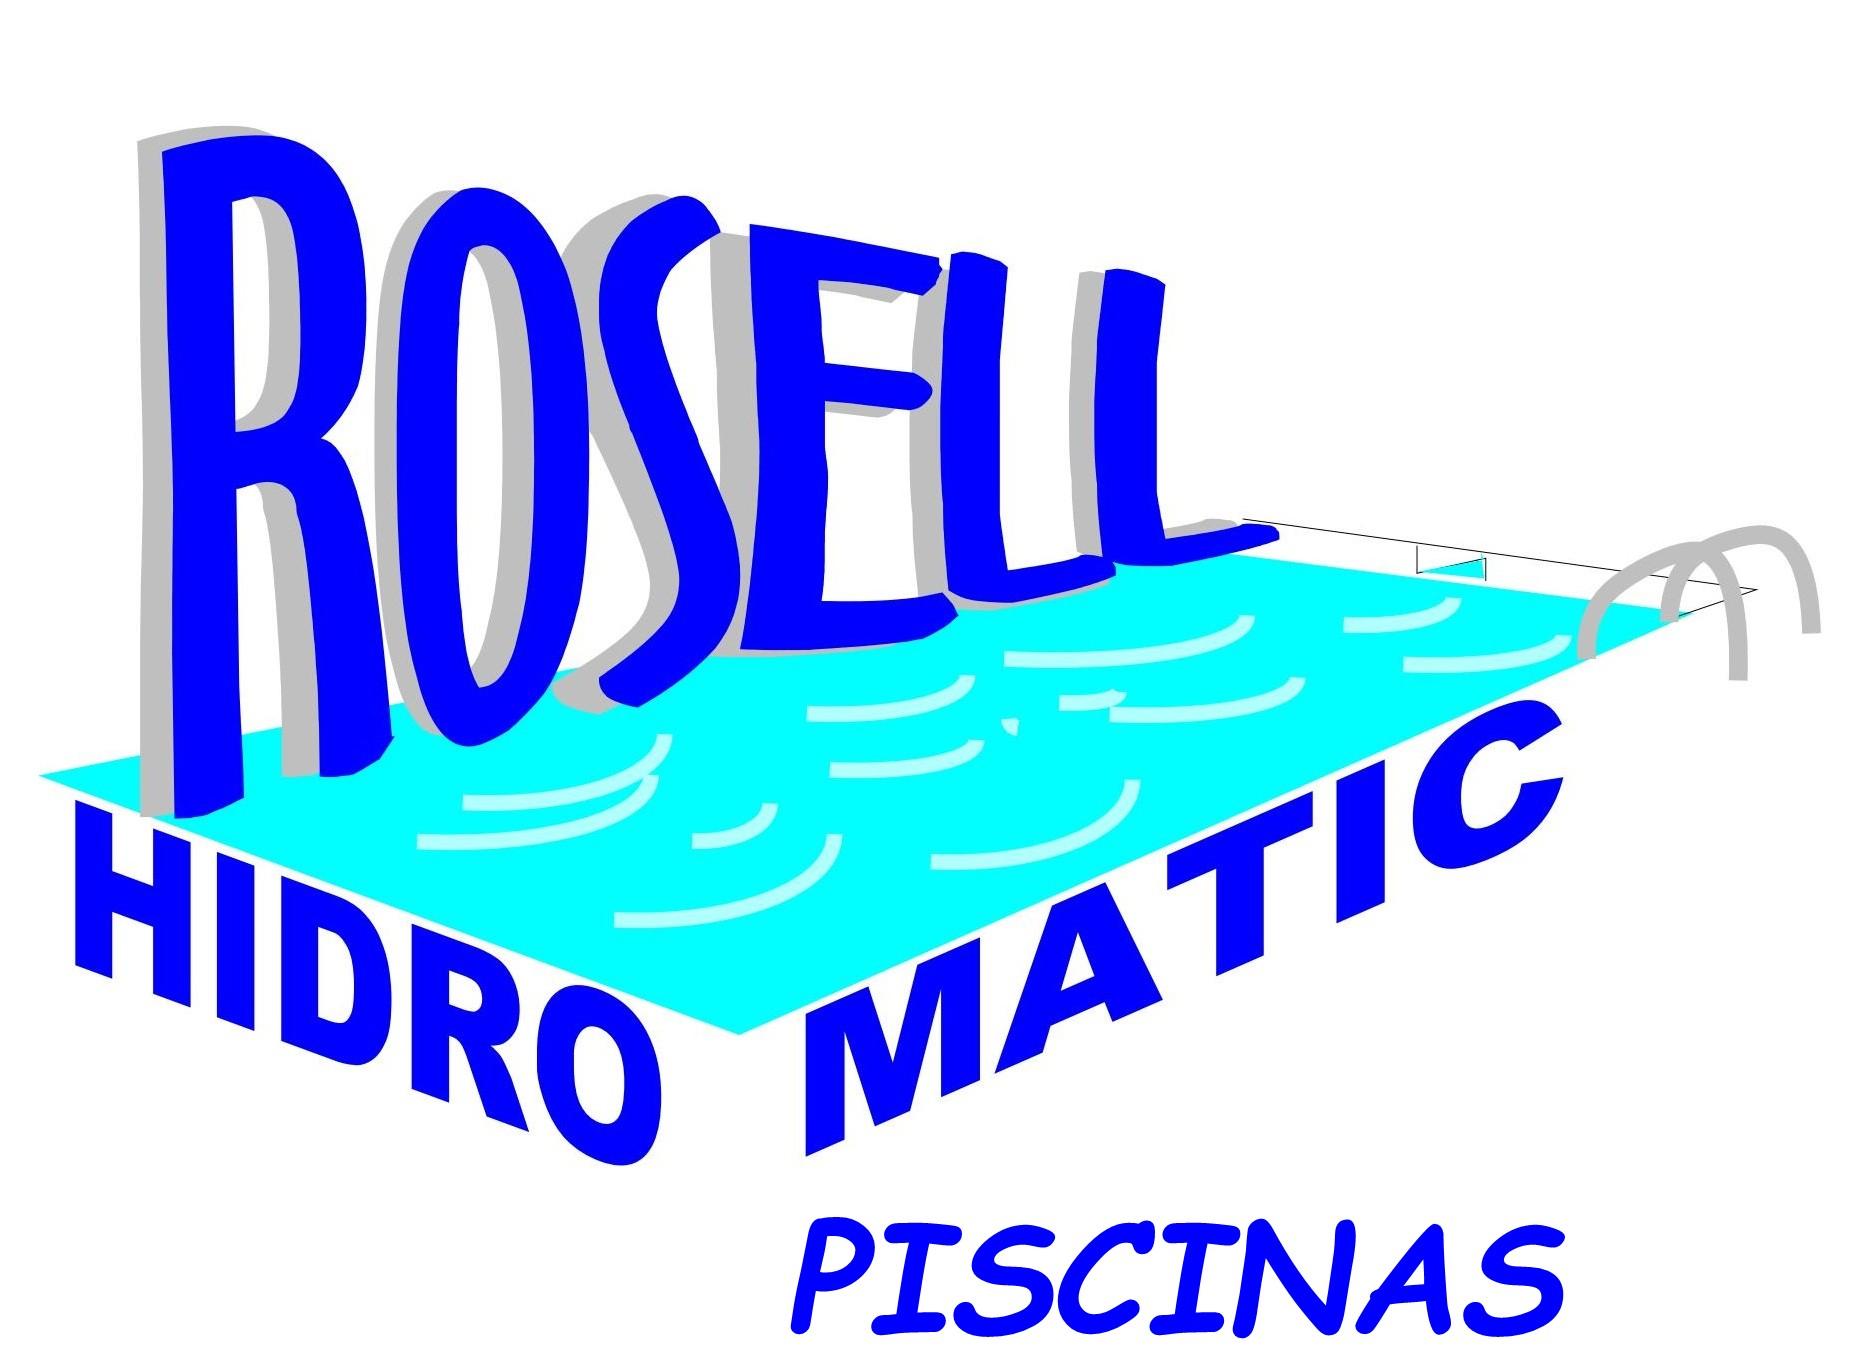 Piscinas Hidromatic Rosell